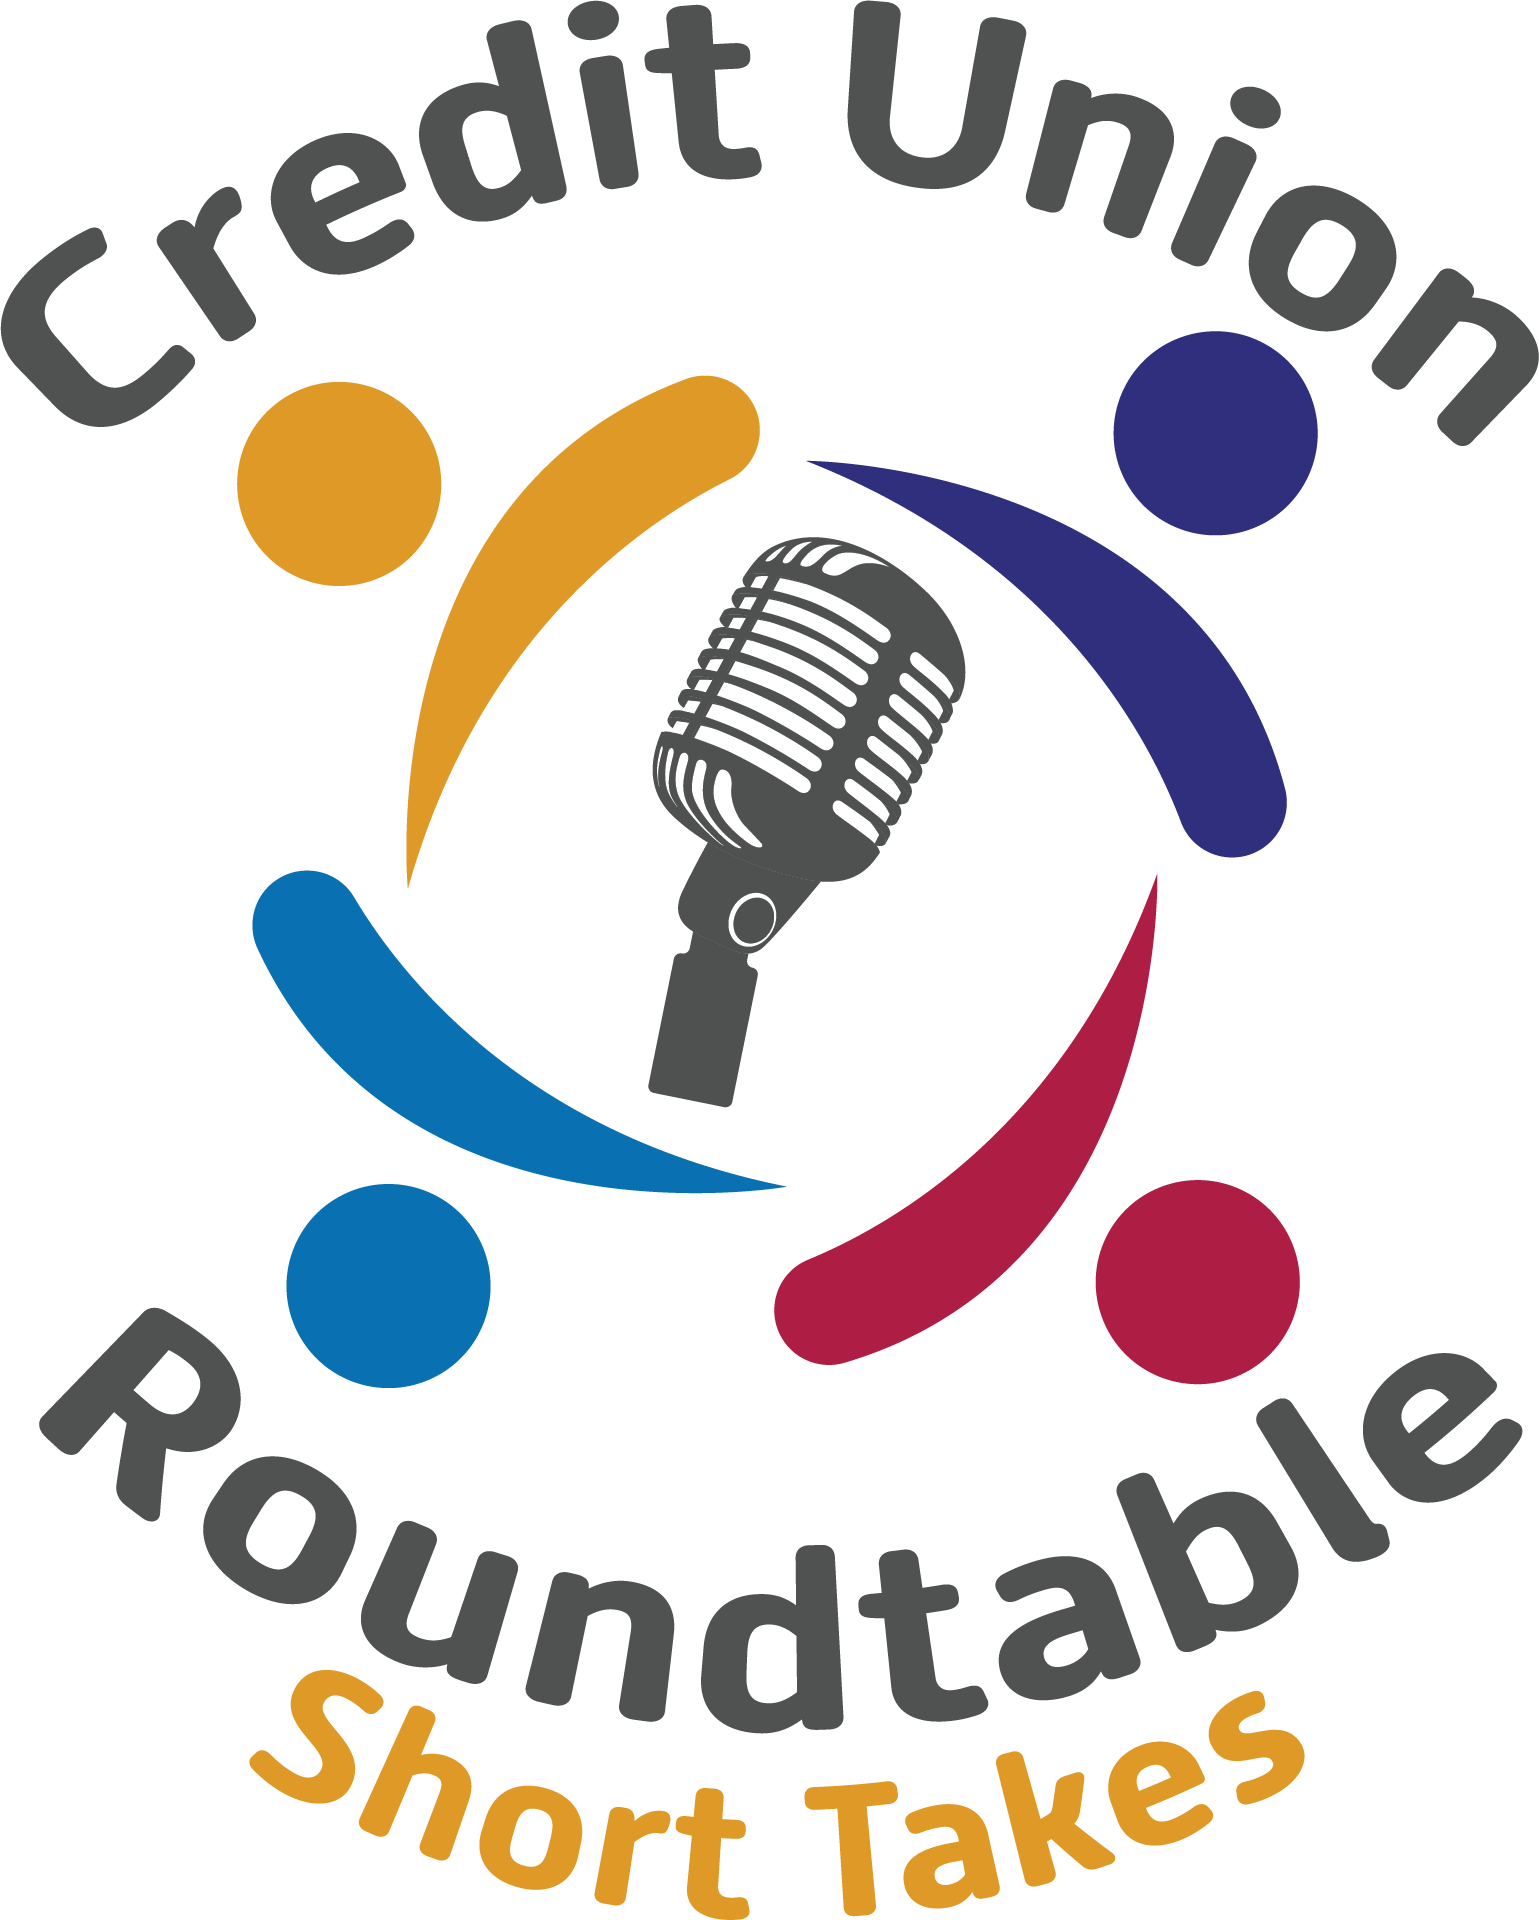 Credit Union Roundtable Short Takes show art